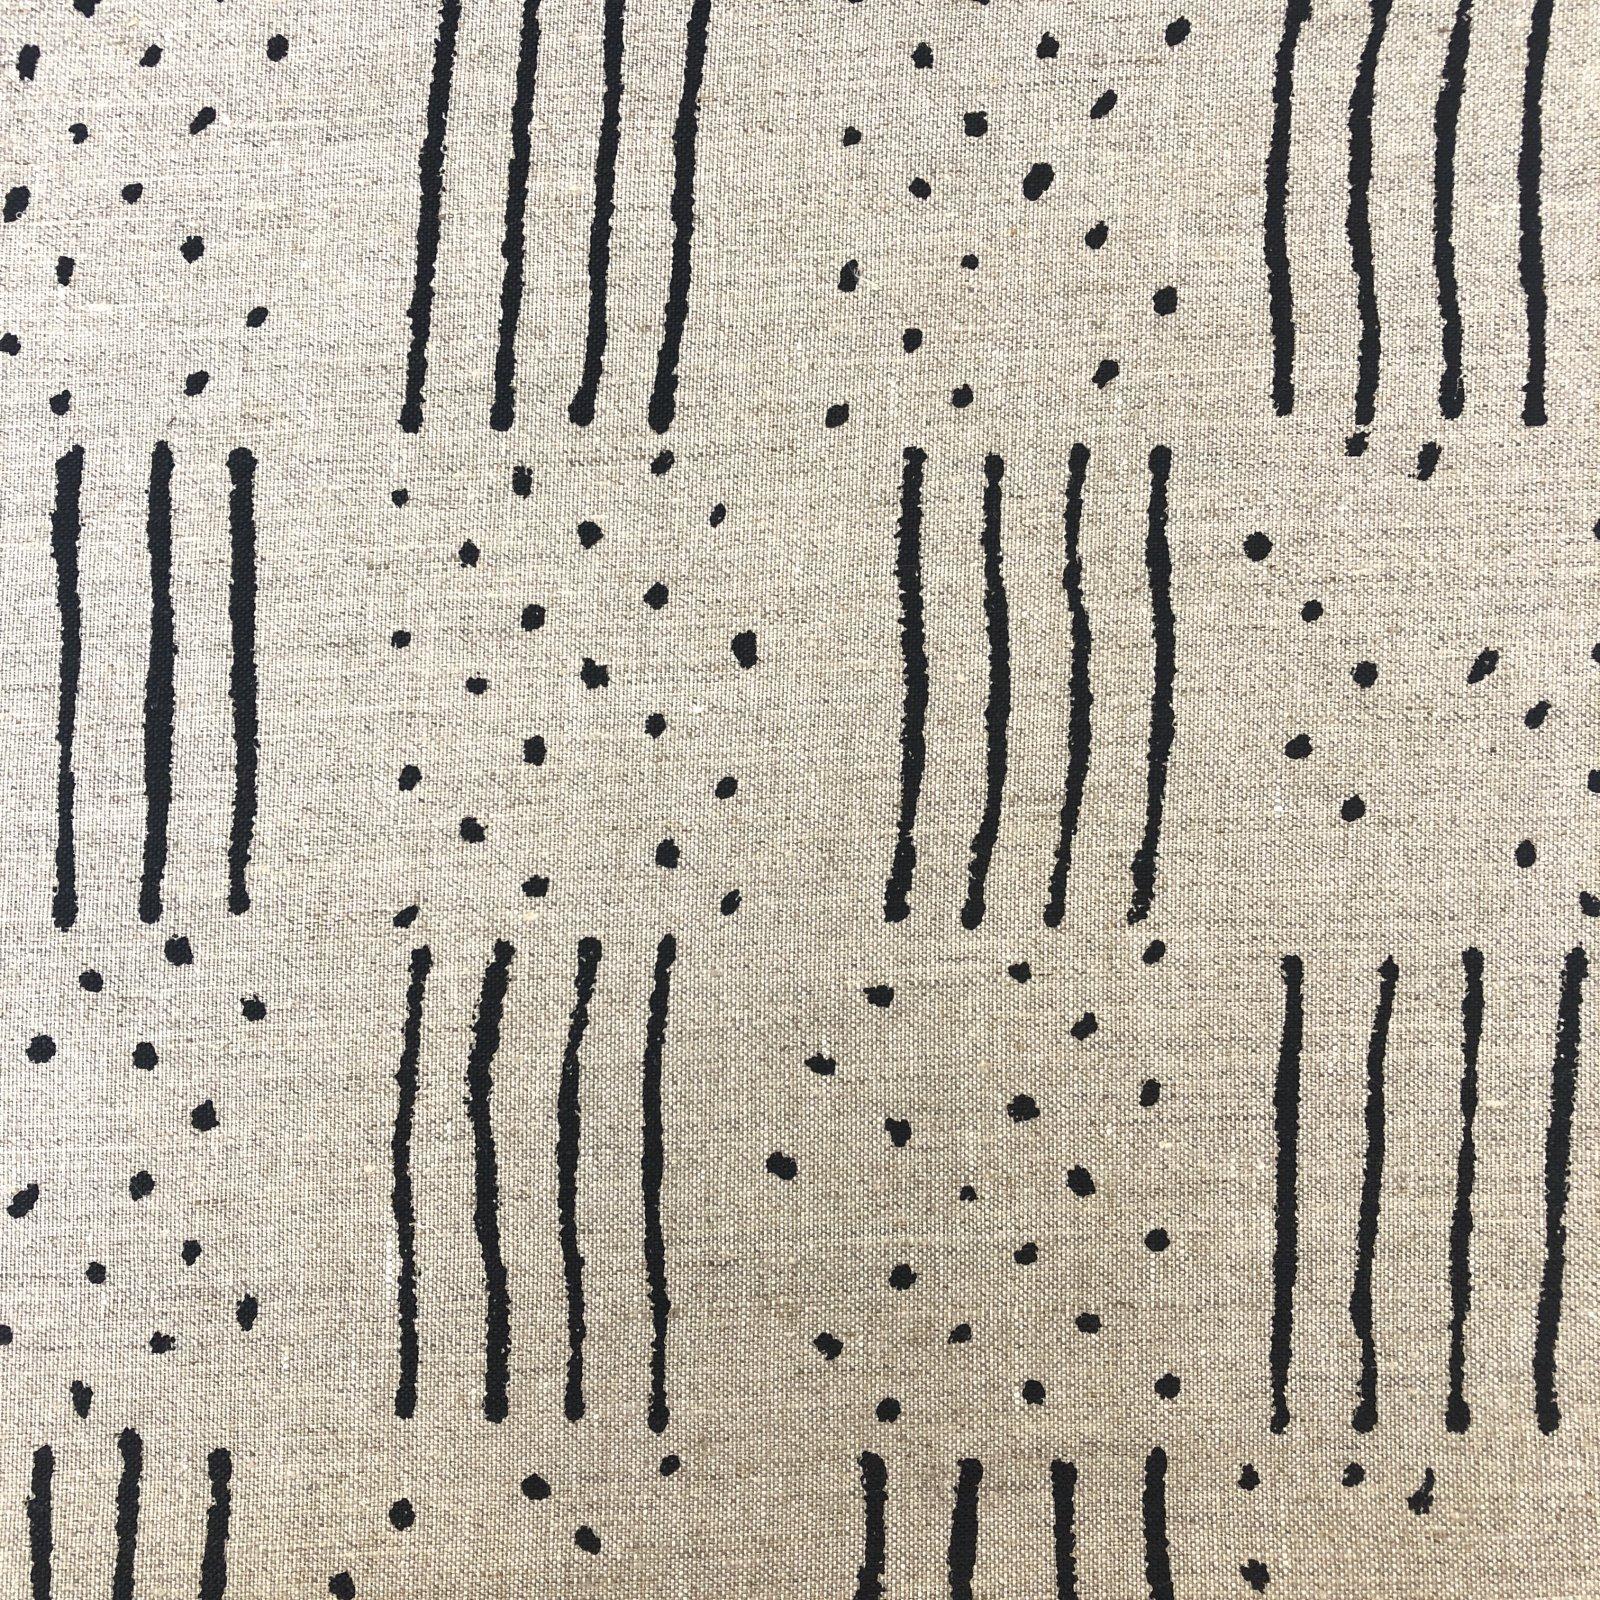 100% Linen - Mudcloth - Black on Natural